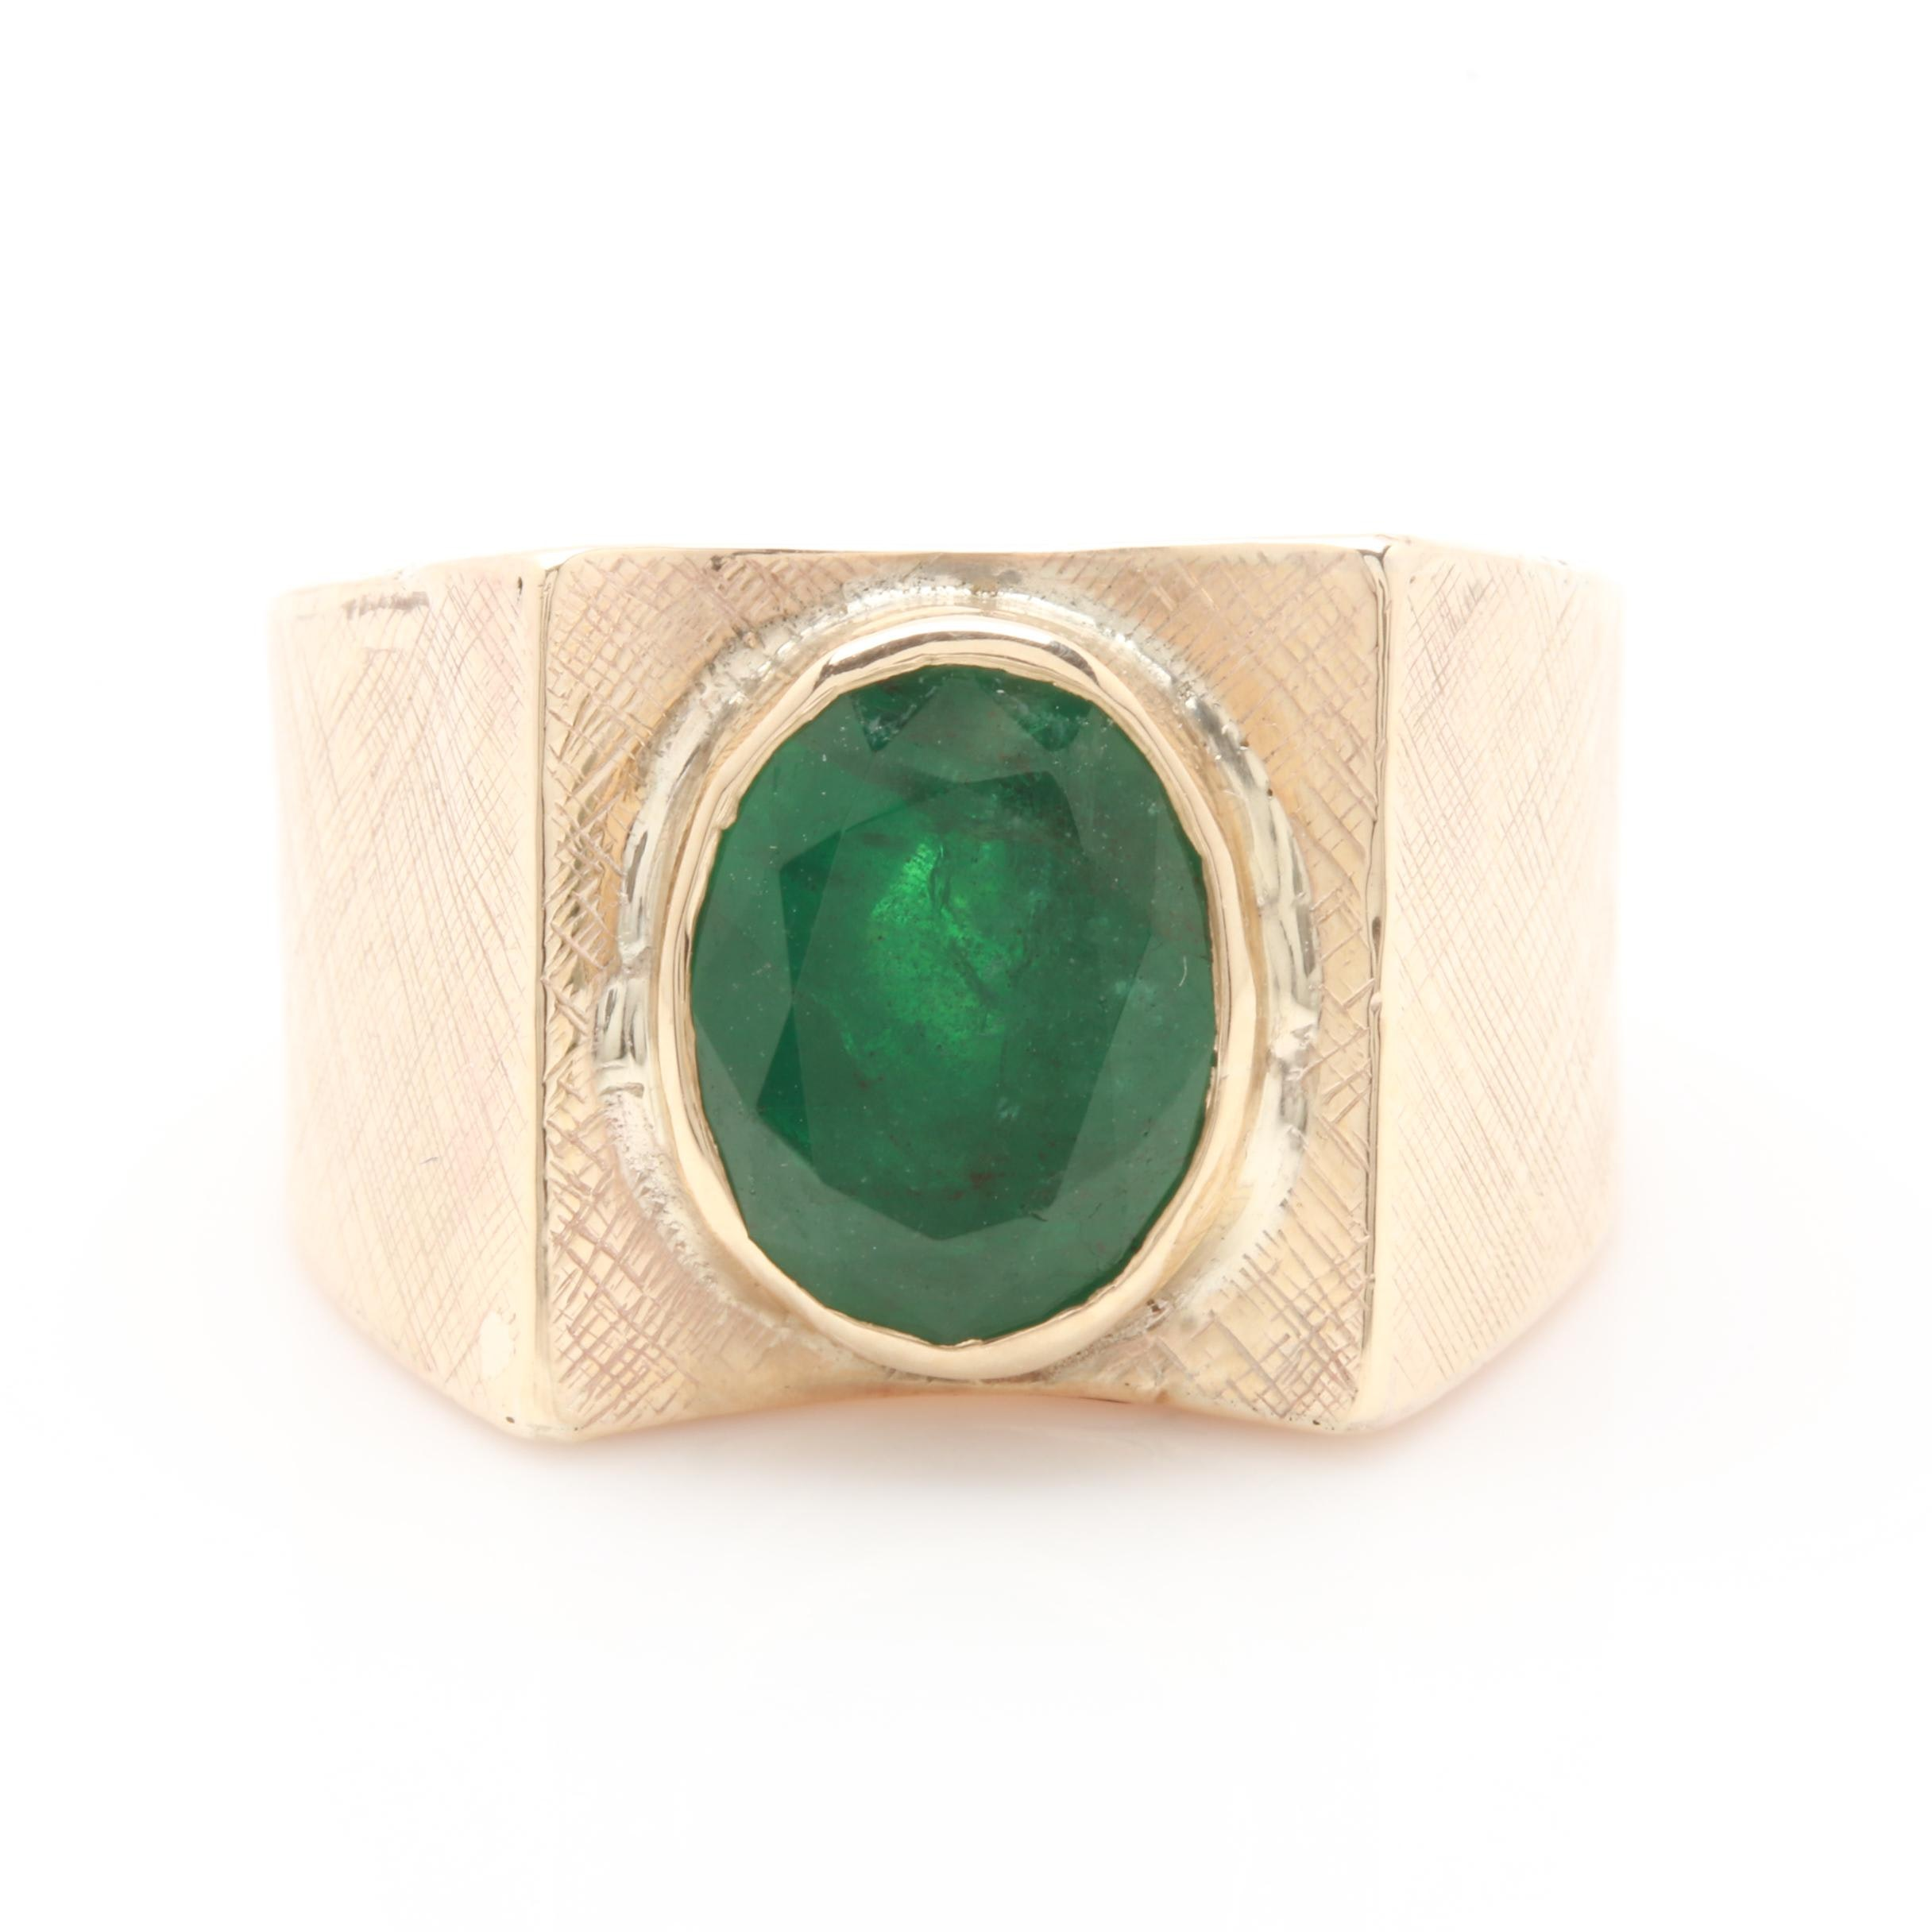 10K Yellow Gold 3.17 CT Emerald Ring